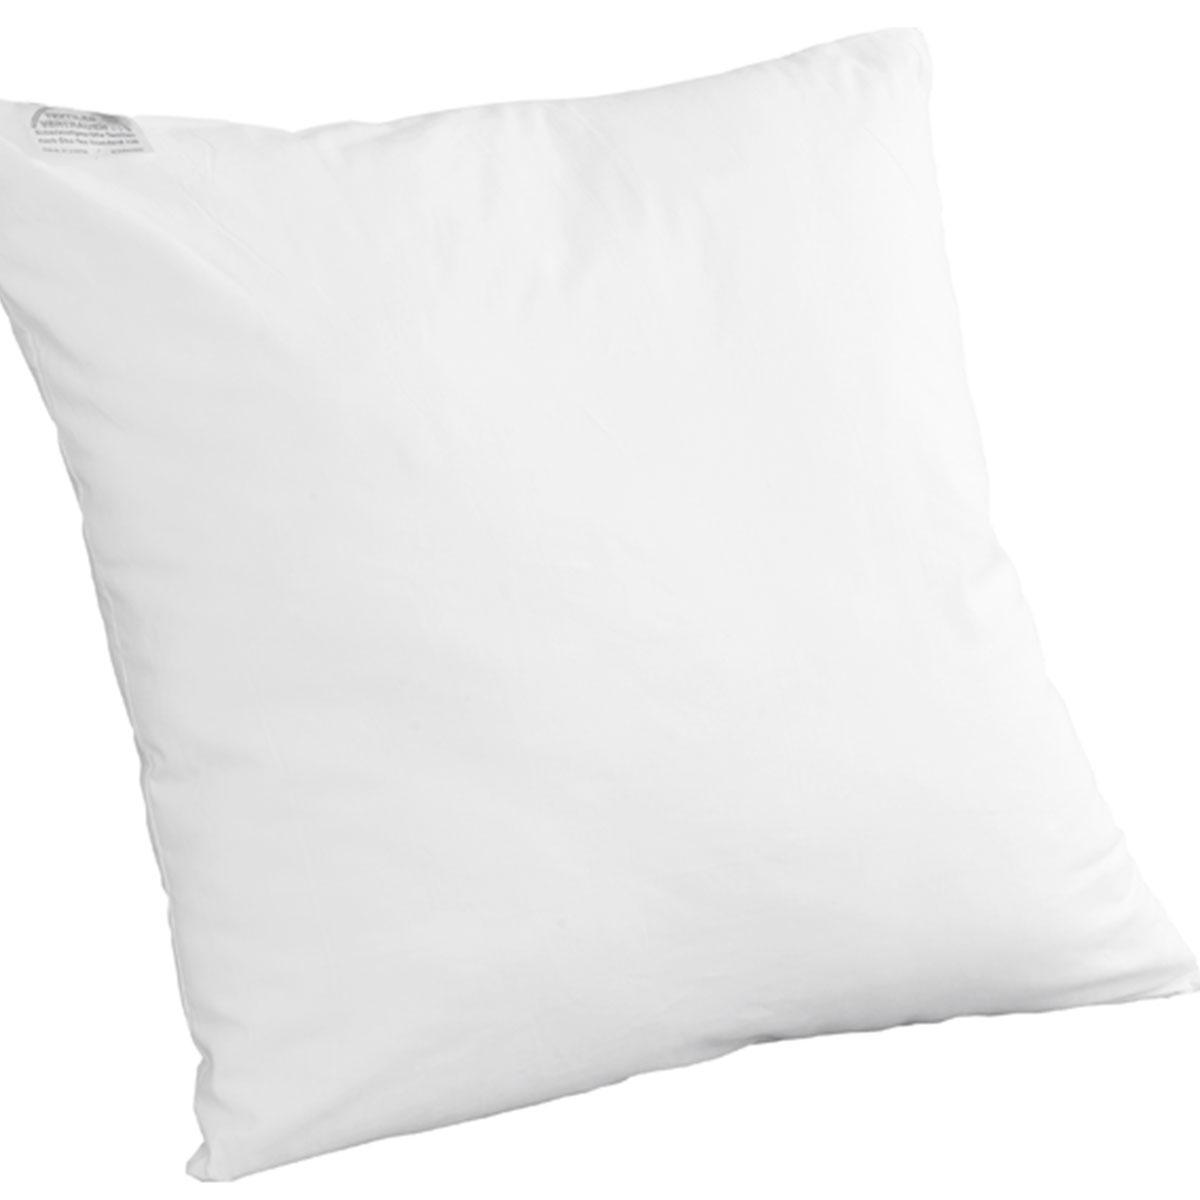 garnissage pour coussin d coratif standard textile. Black Bedroom Furniture Sets. Home Design Ideas